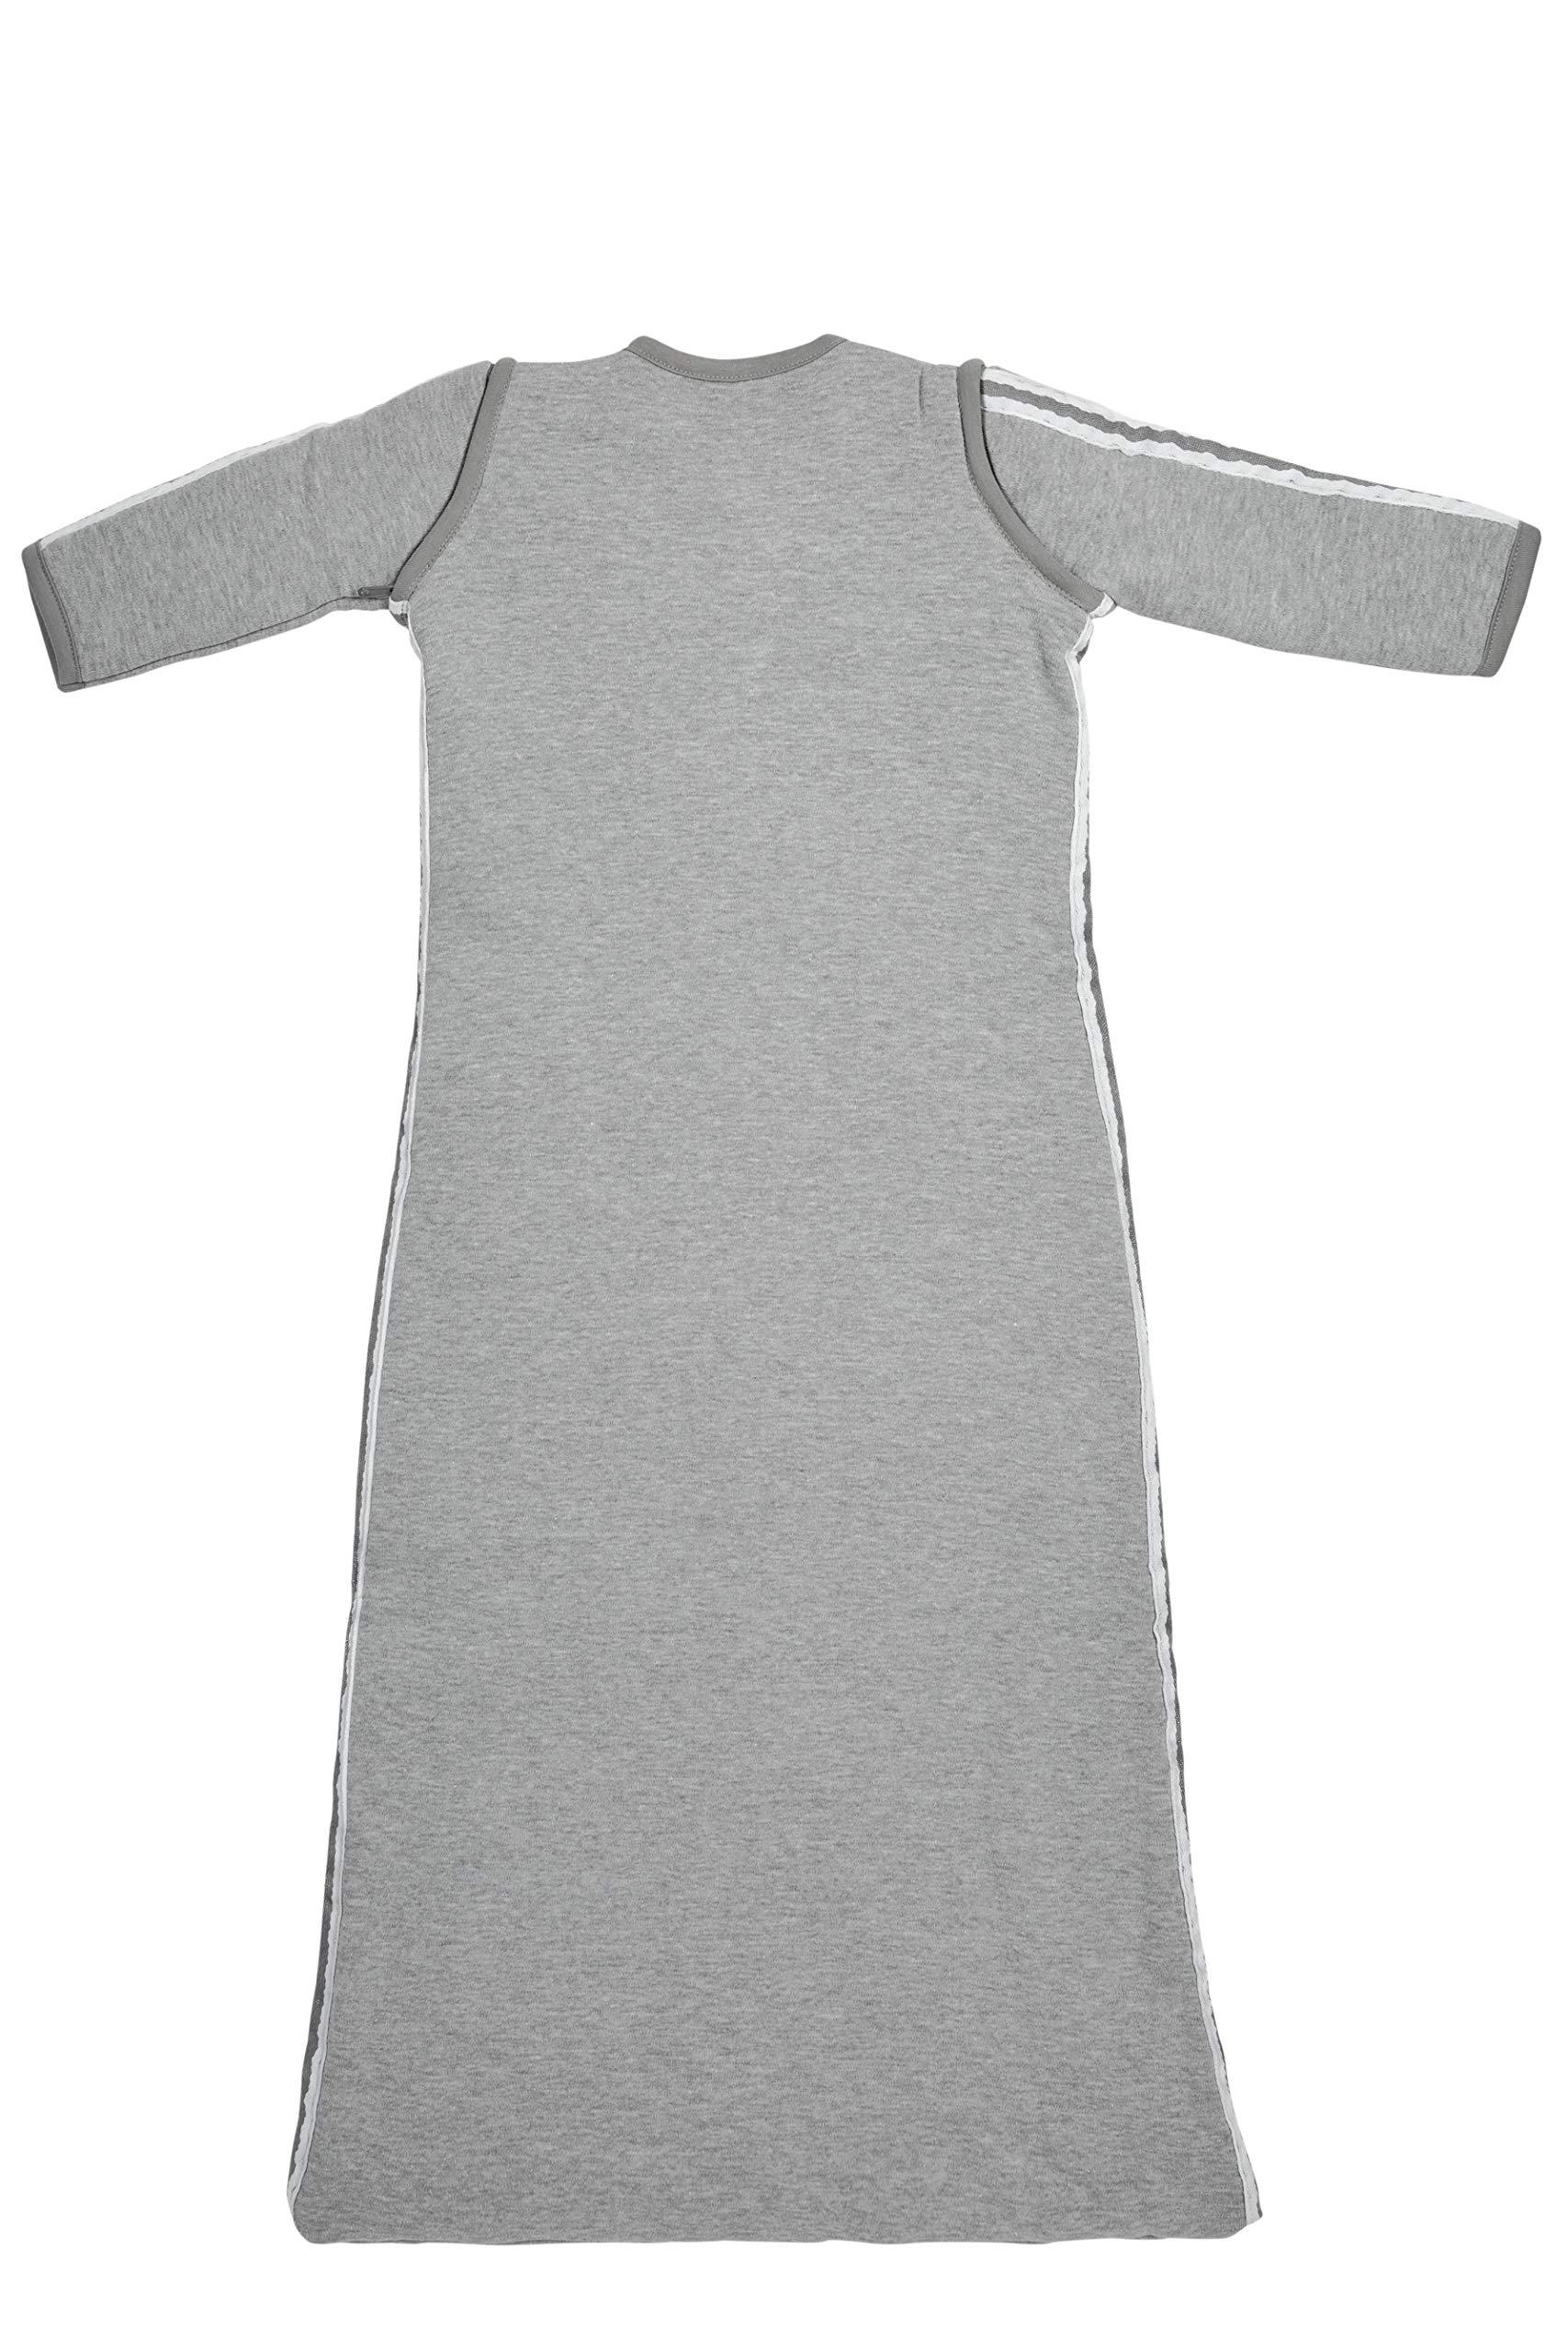 81kr6AGdfCL - Meyco 514025Saco de dormir de invierno 90cm, Gris con Lurex ribete gris